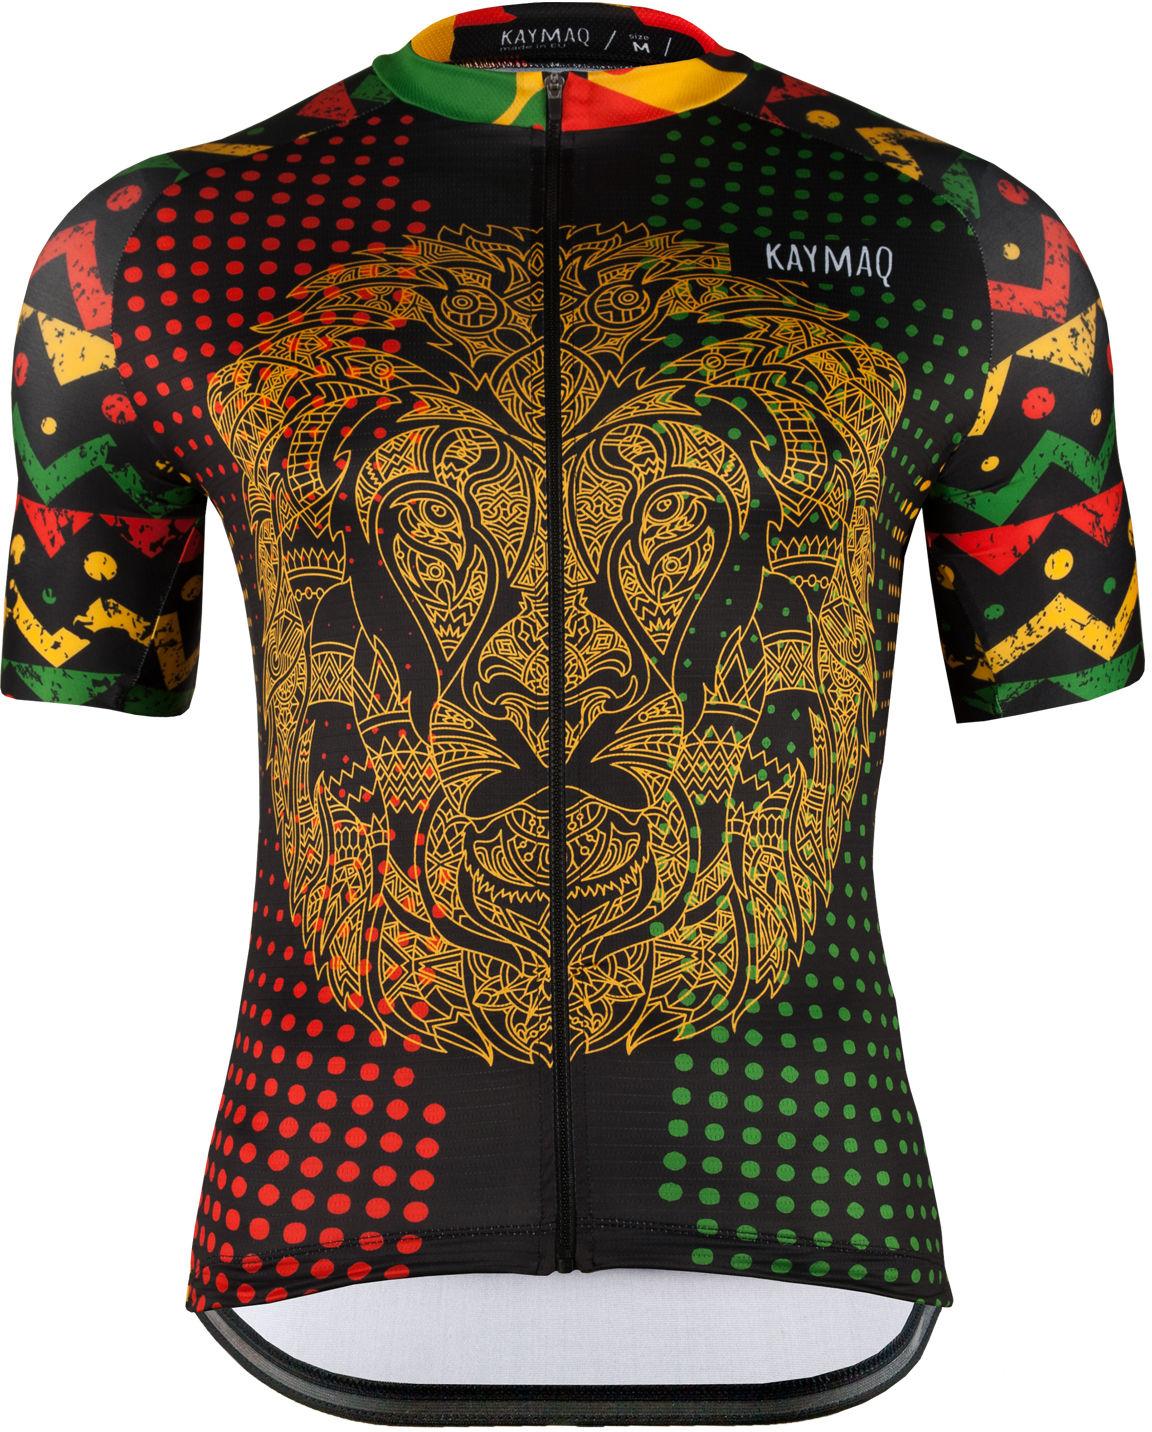 KAYMAQ RACE M51 męska koszulka rowerowa z krótkim rękawem Rozmiar: XL,m51_kymq_kosz